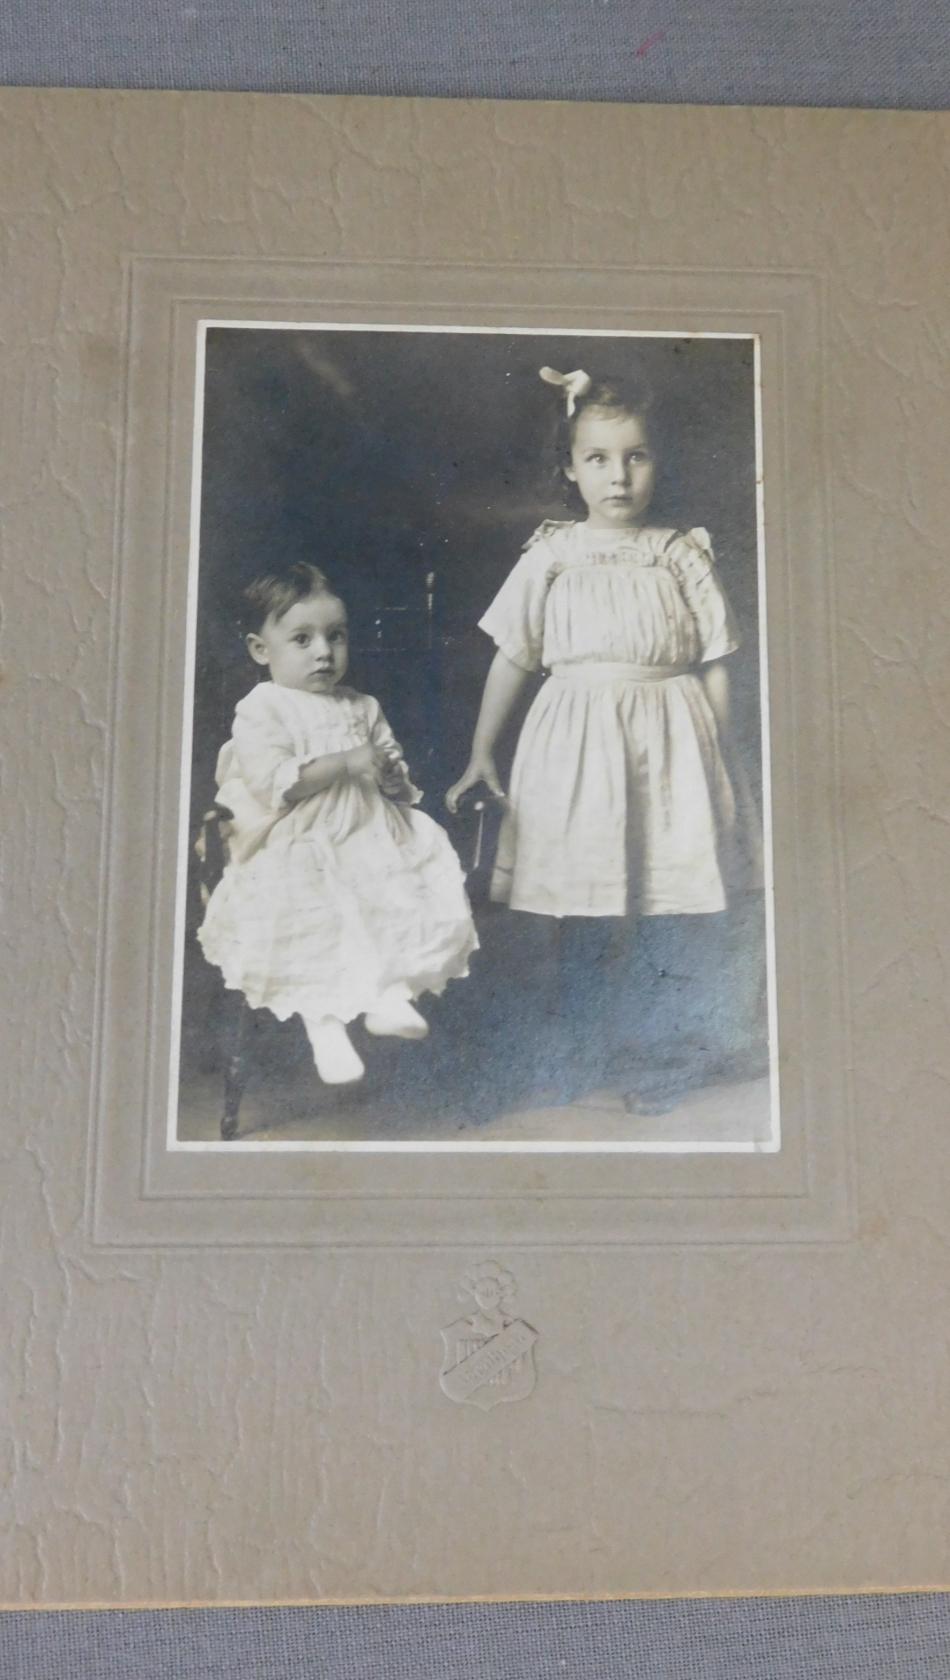 Vintage 2 Victorian Children Cabinet Card Photo, 1800s Photograph